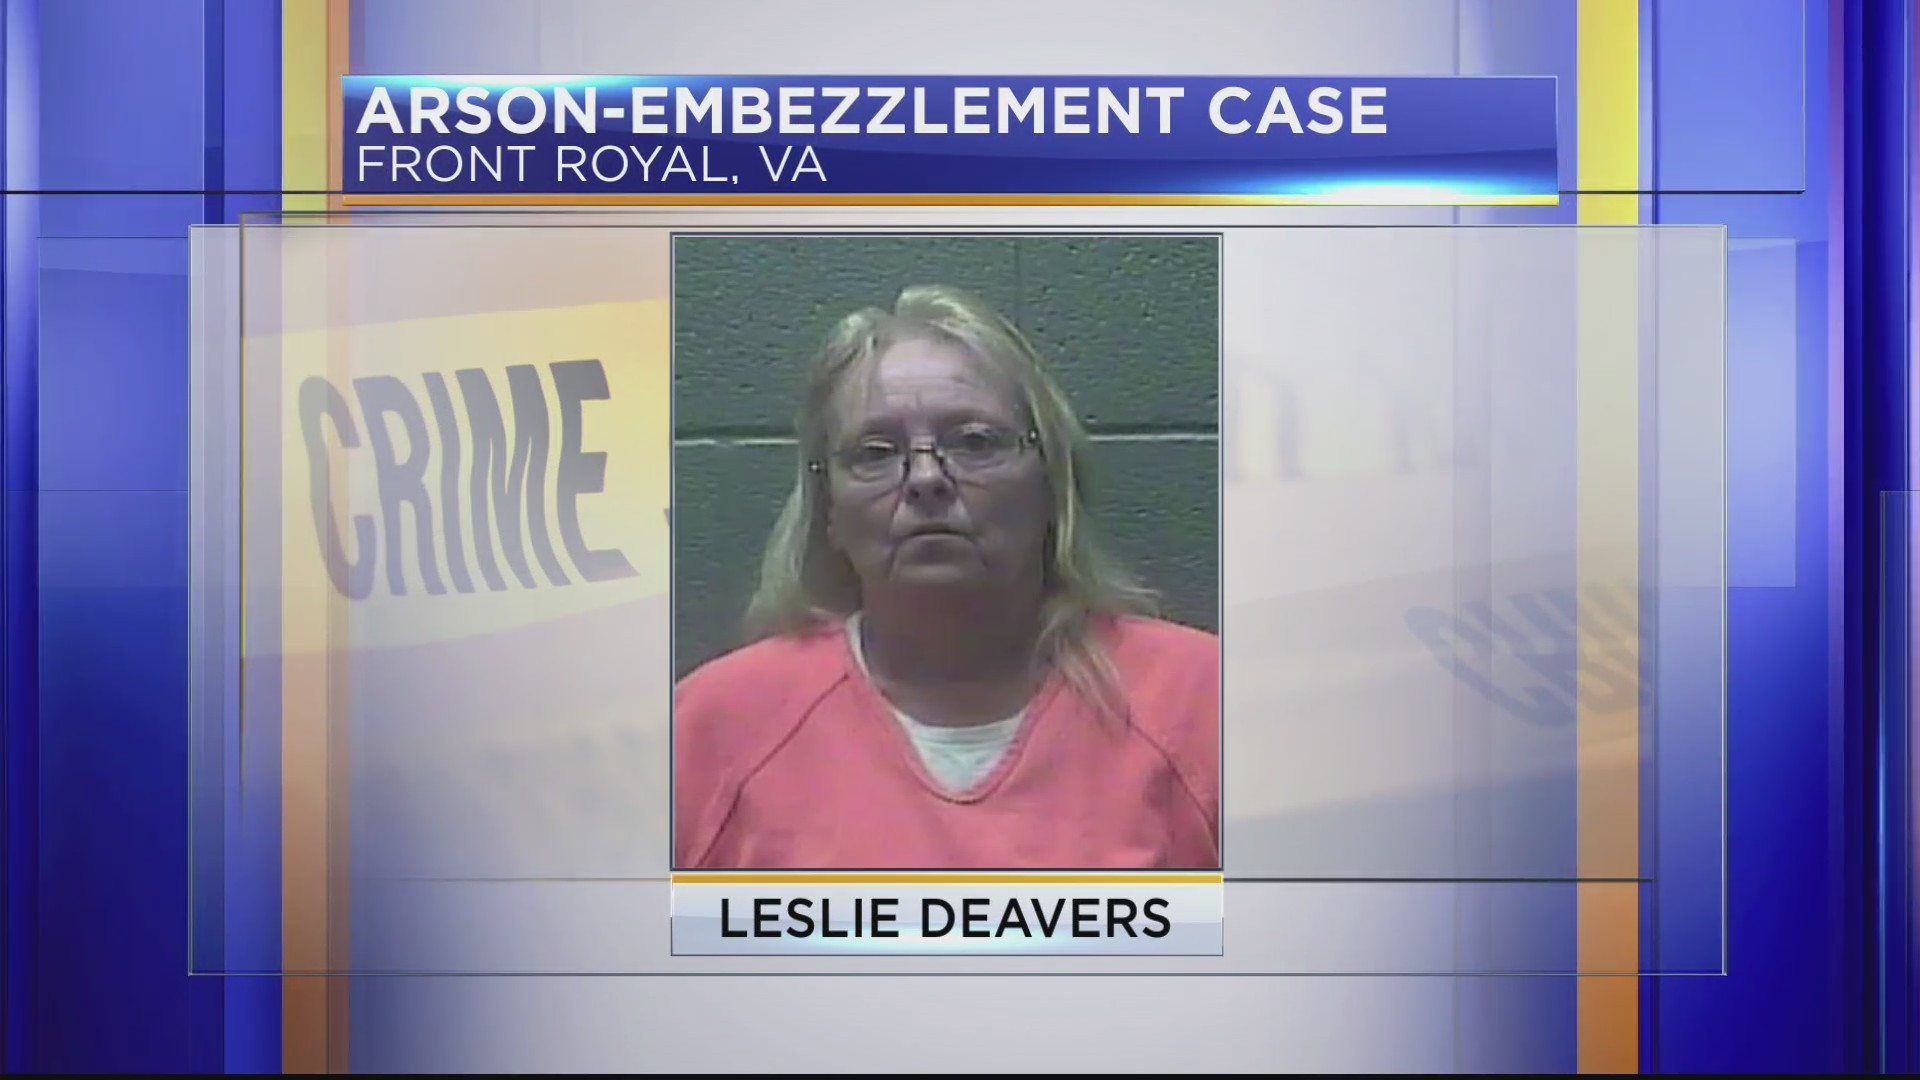 ARSON-EMBEZZLEMENT CASE